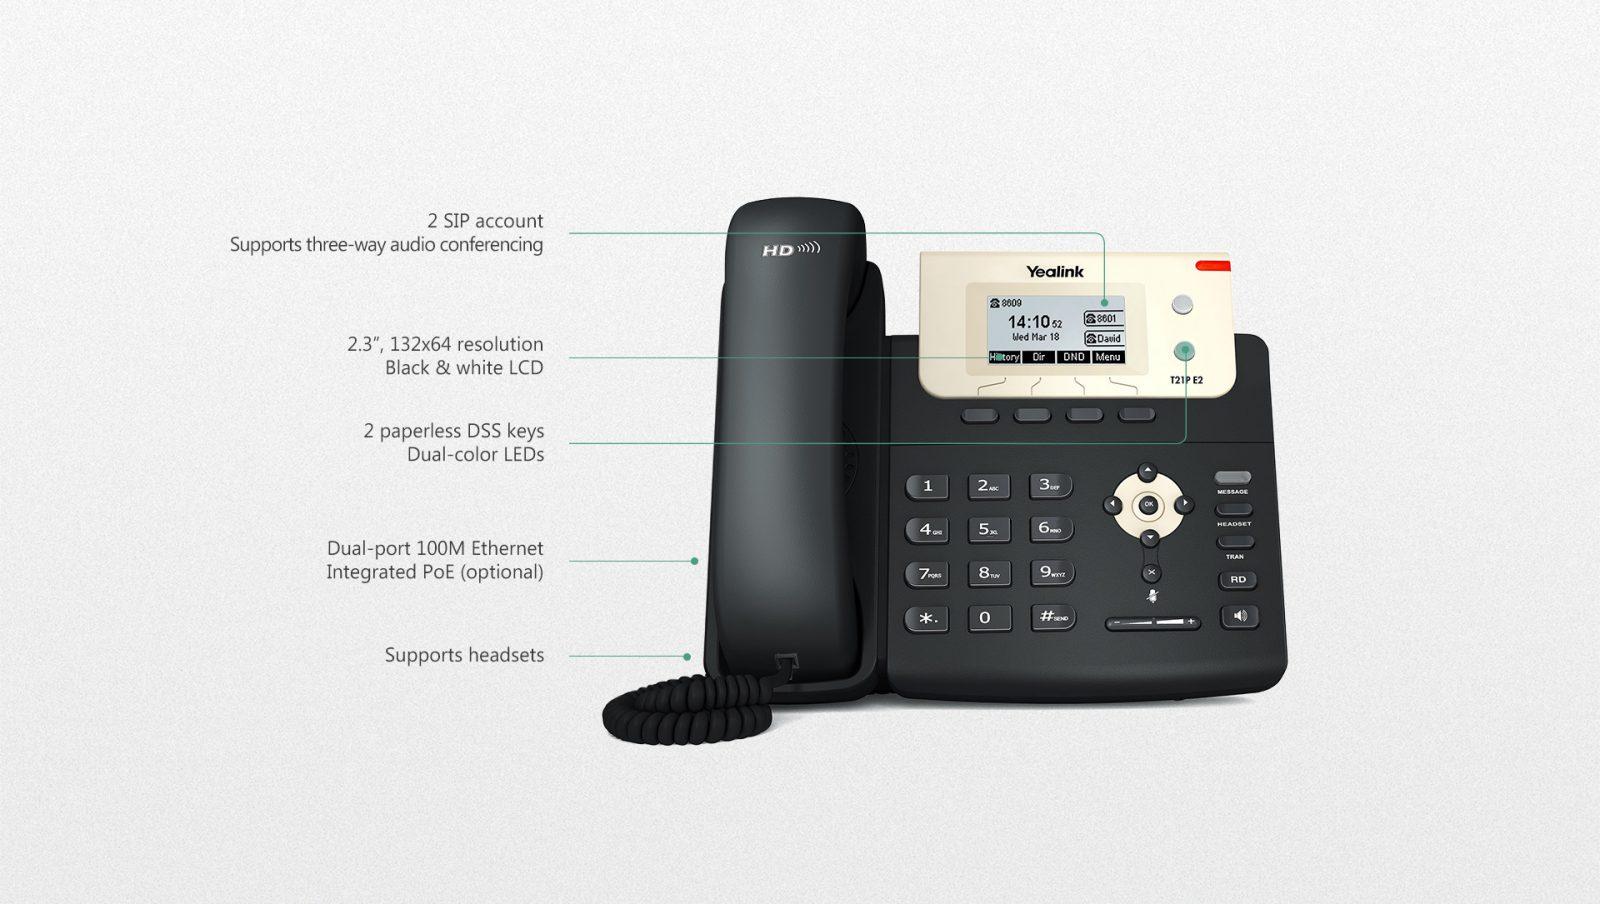 Yealink T21 IP Phone - Hong Kong Hotline: 39001988 - Matrix Technology (HK) Ltd